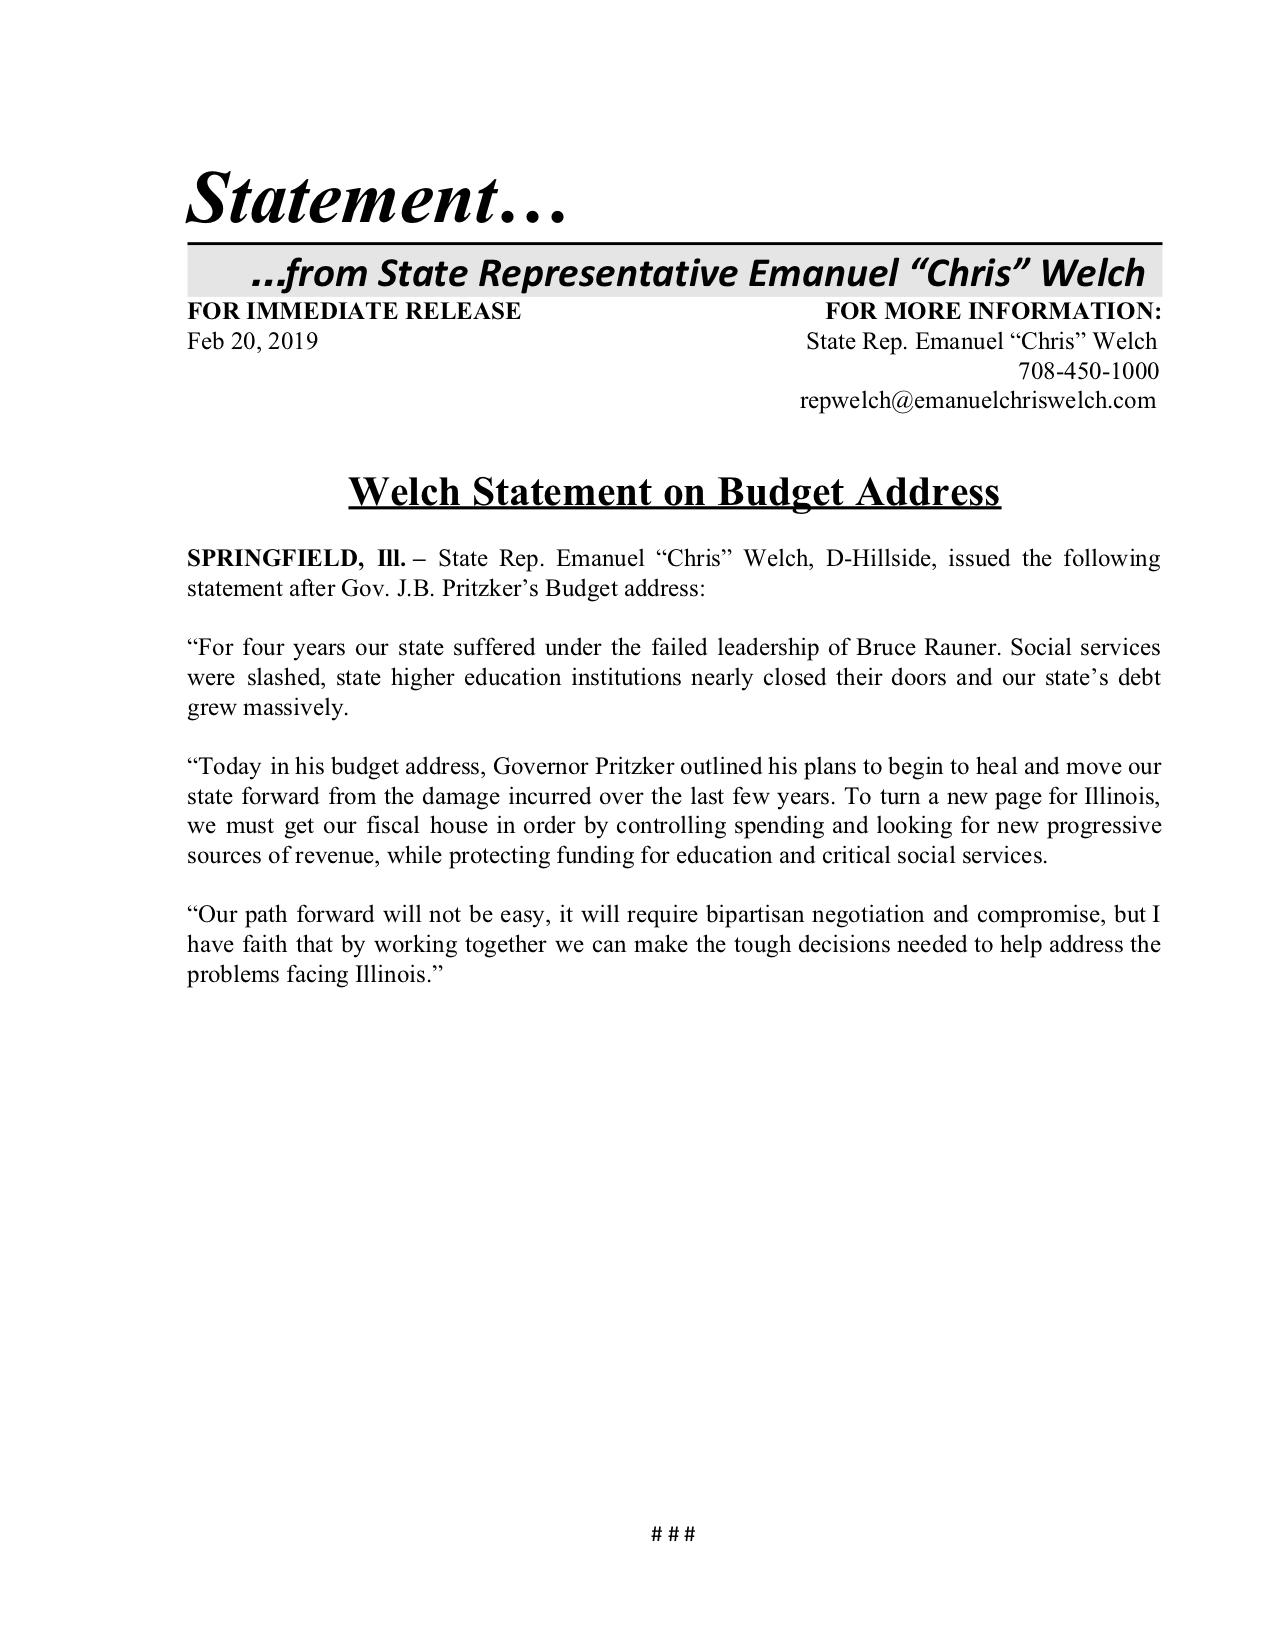 Willis, Welch to Spearhead Hearing Examining Westlake Hospital Closure  (February 20, 2019)